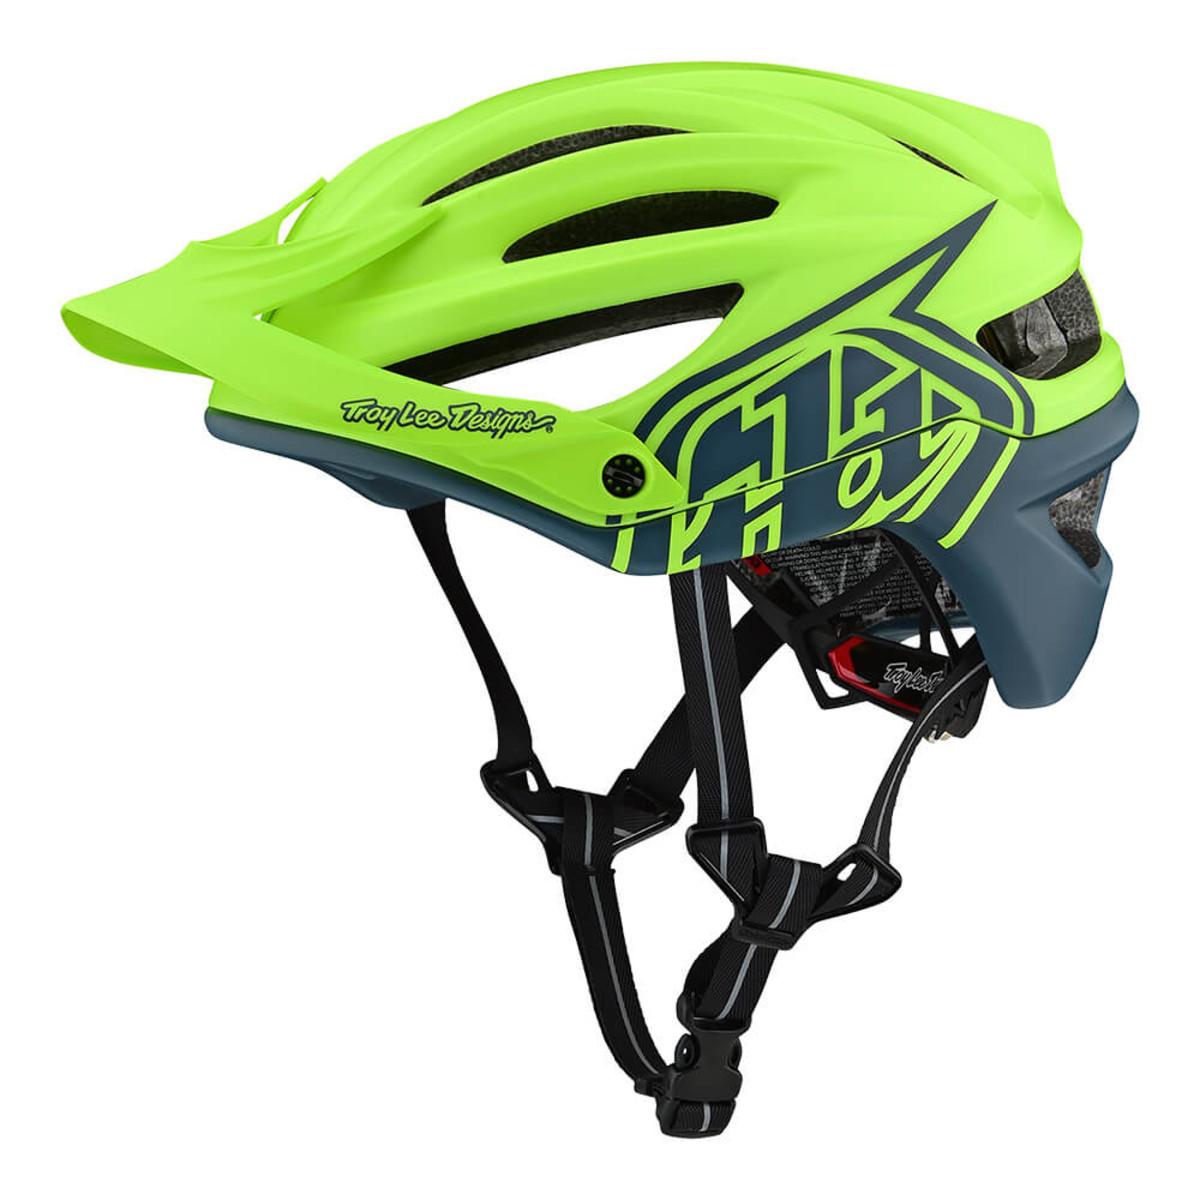 Вело шлем TLD A2 Mips Decoy [Flo Yellow / AIR Force Blue] размер XL/XXL